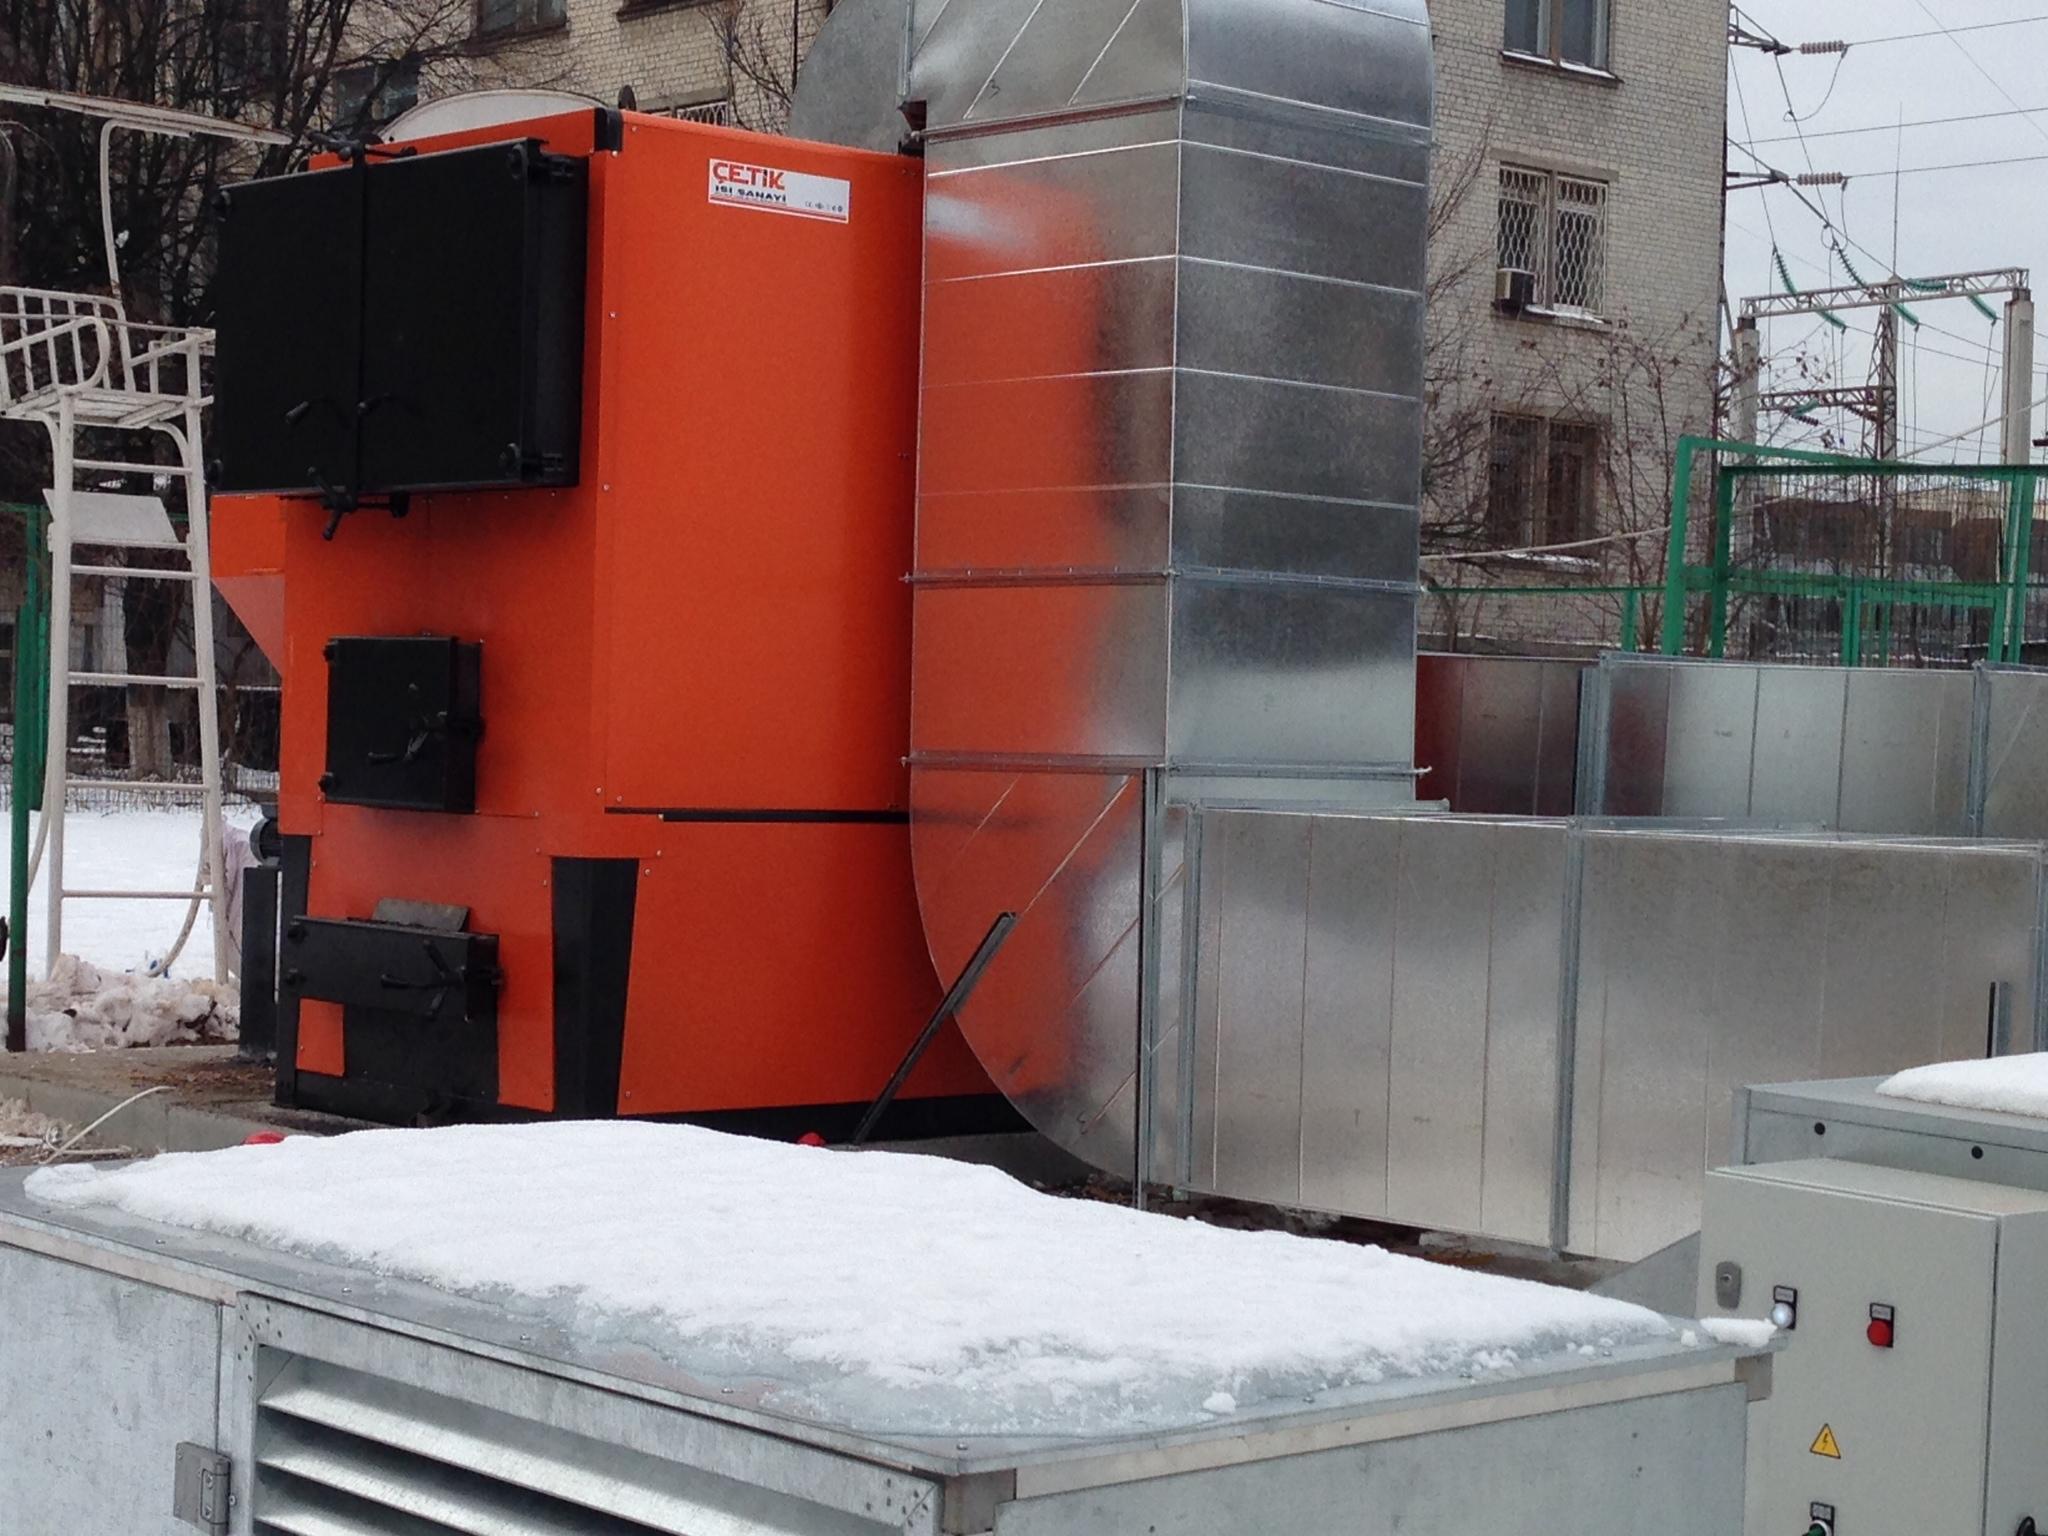 Теплогенератор на пелетах 407 кВт - Референції | ЕкоЕнергоПроект